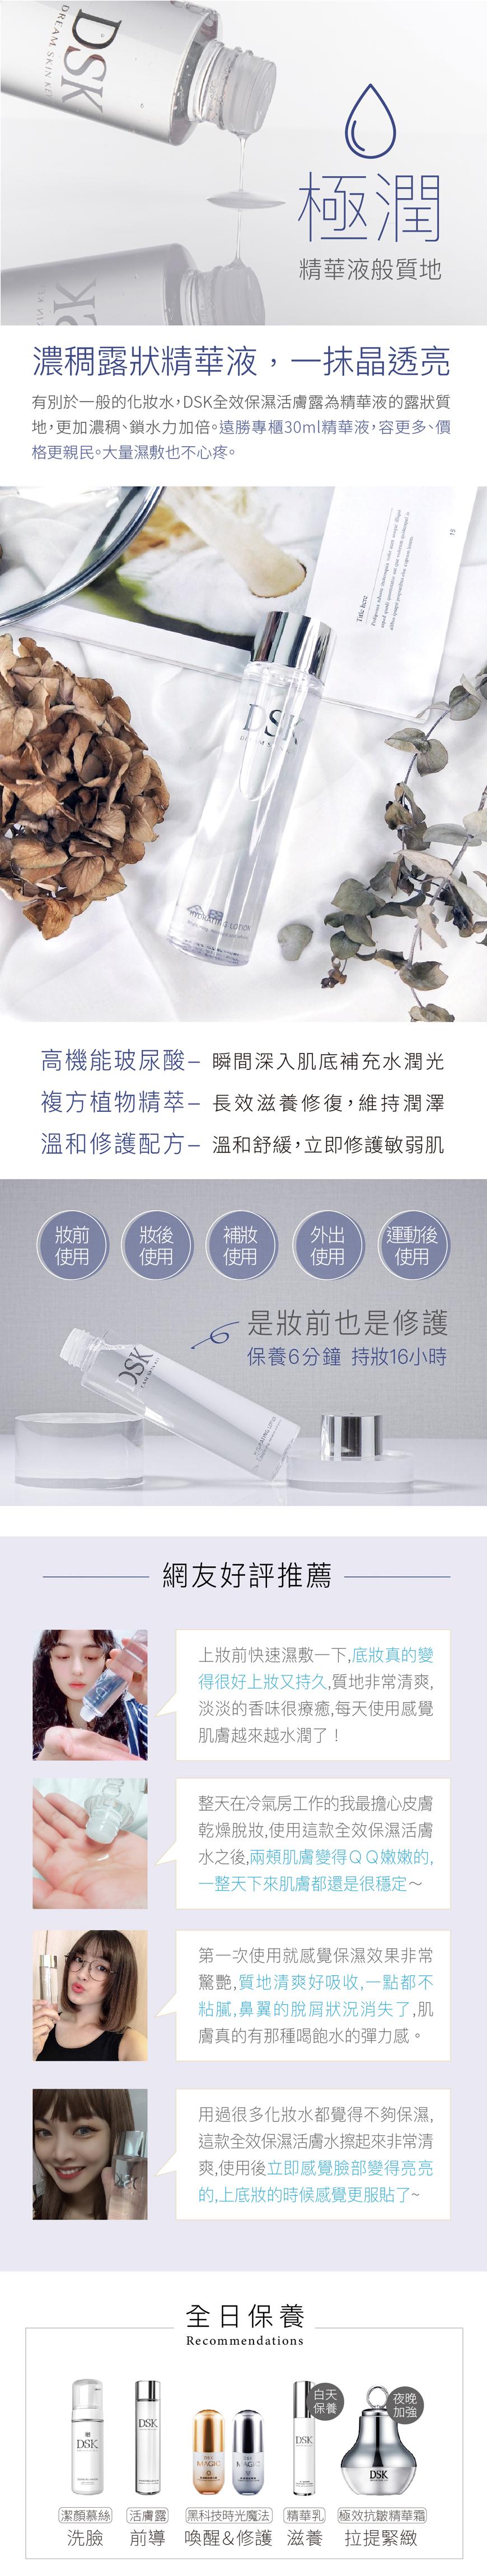 02-DSK-全效保濕活膚露-長條圖02